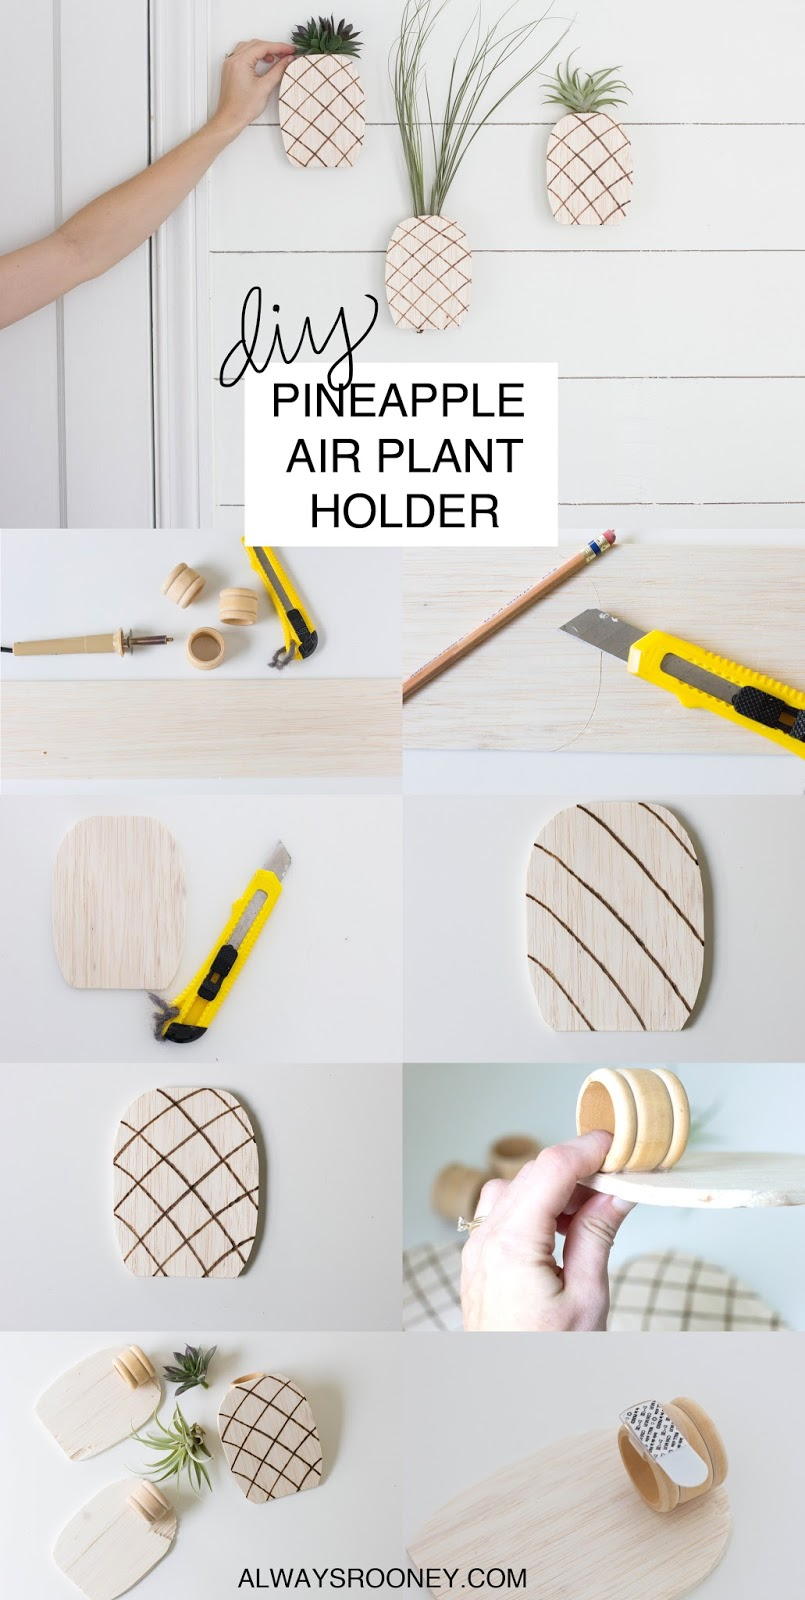 always rooney: Pineapple Air Plant Holder | DIY